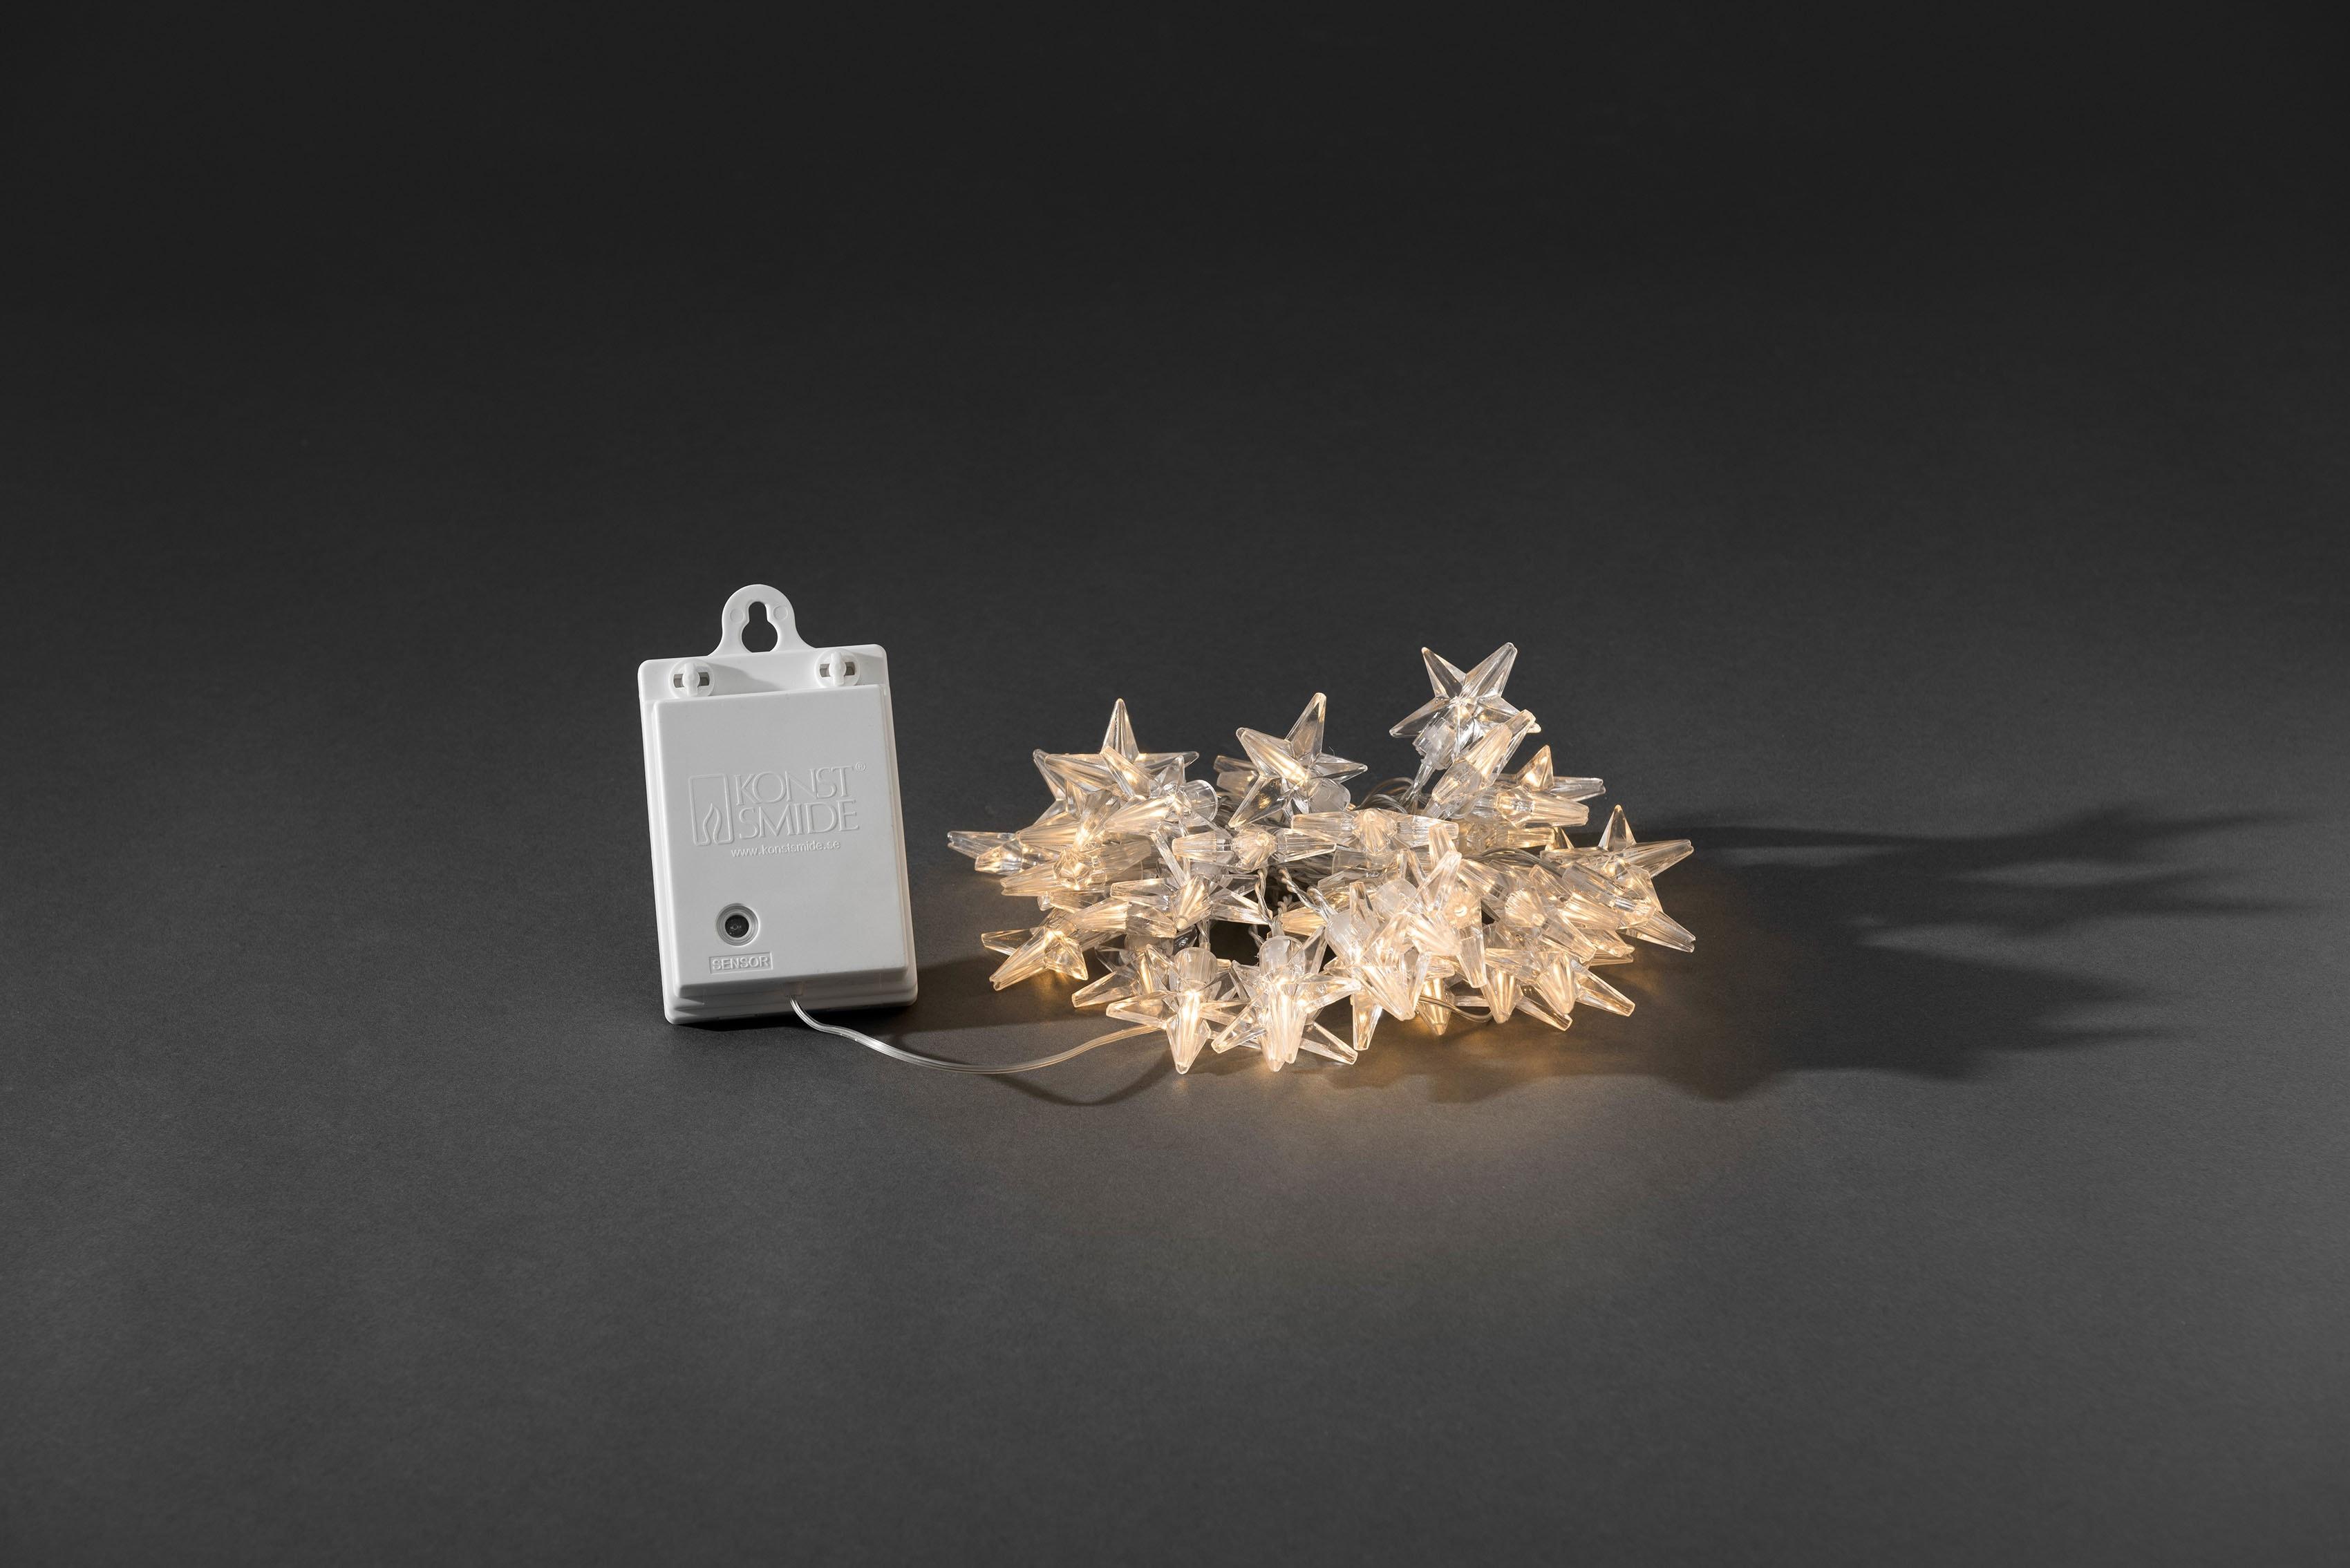 KONSTSMIDE LED-Lichterkette, 80 St.-flammig, LED Dekolichterkette, Acryl Sterne, 80 warm weiße Dioden